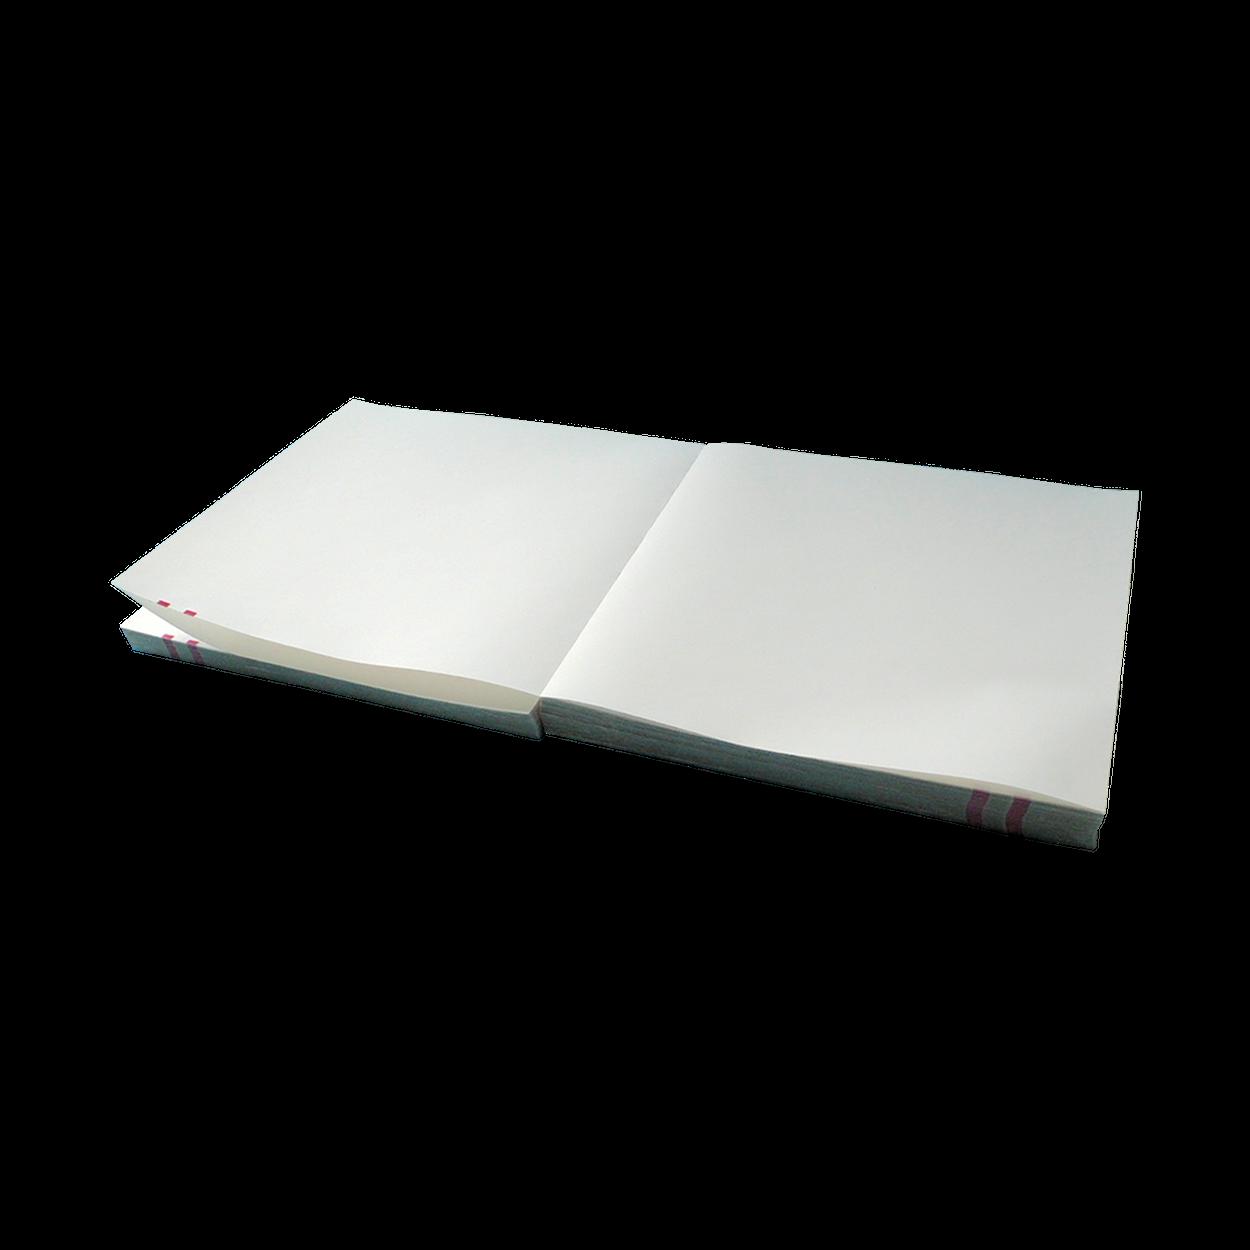 143х150х300, реестр 4168, бумага для фетального монитора, КТГ, без сетки и метки